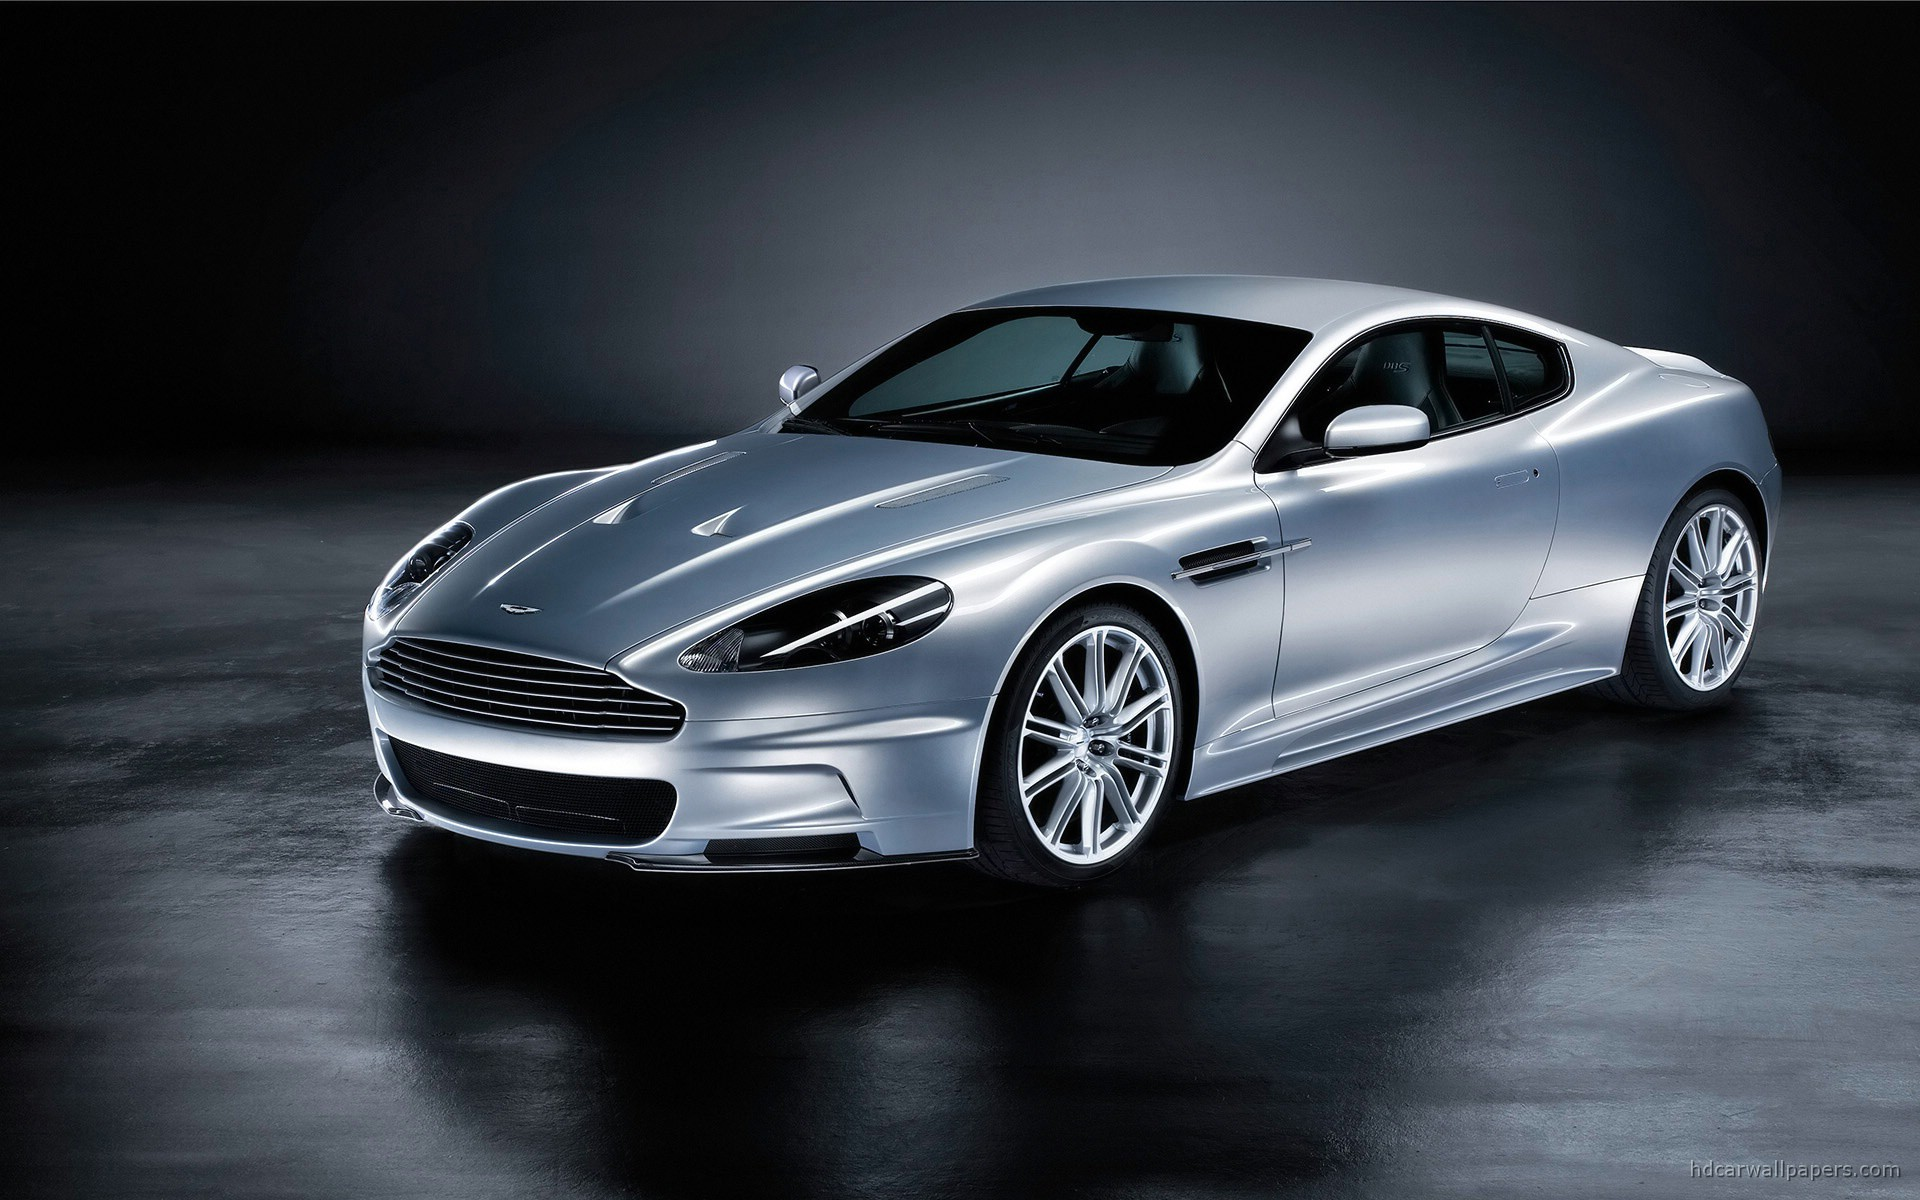 Aston Martin Dbs Widescreen Wallpaper Hd Car Wallpapers Id 20